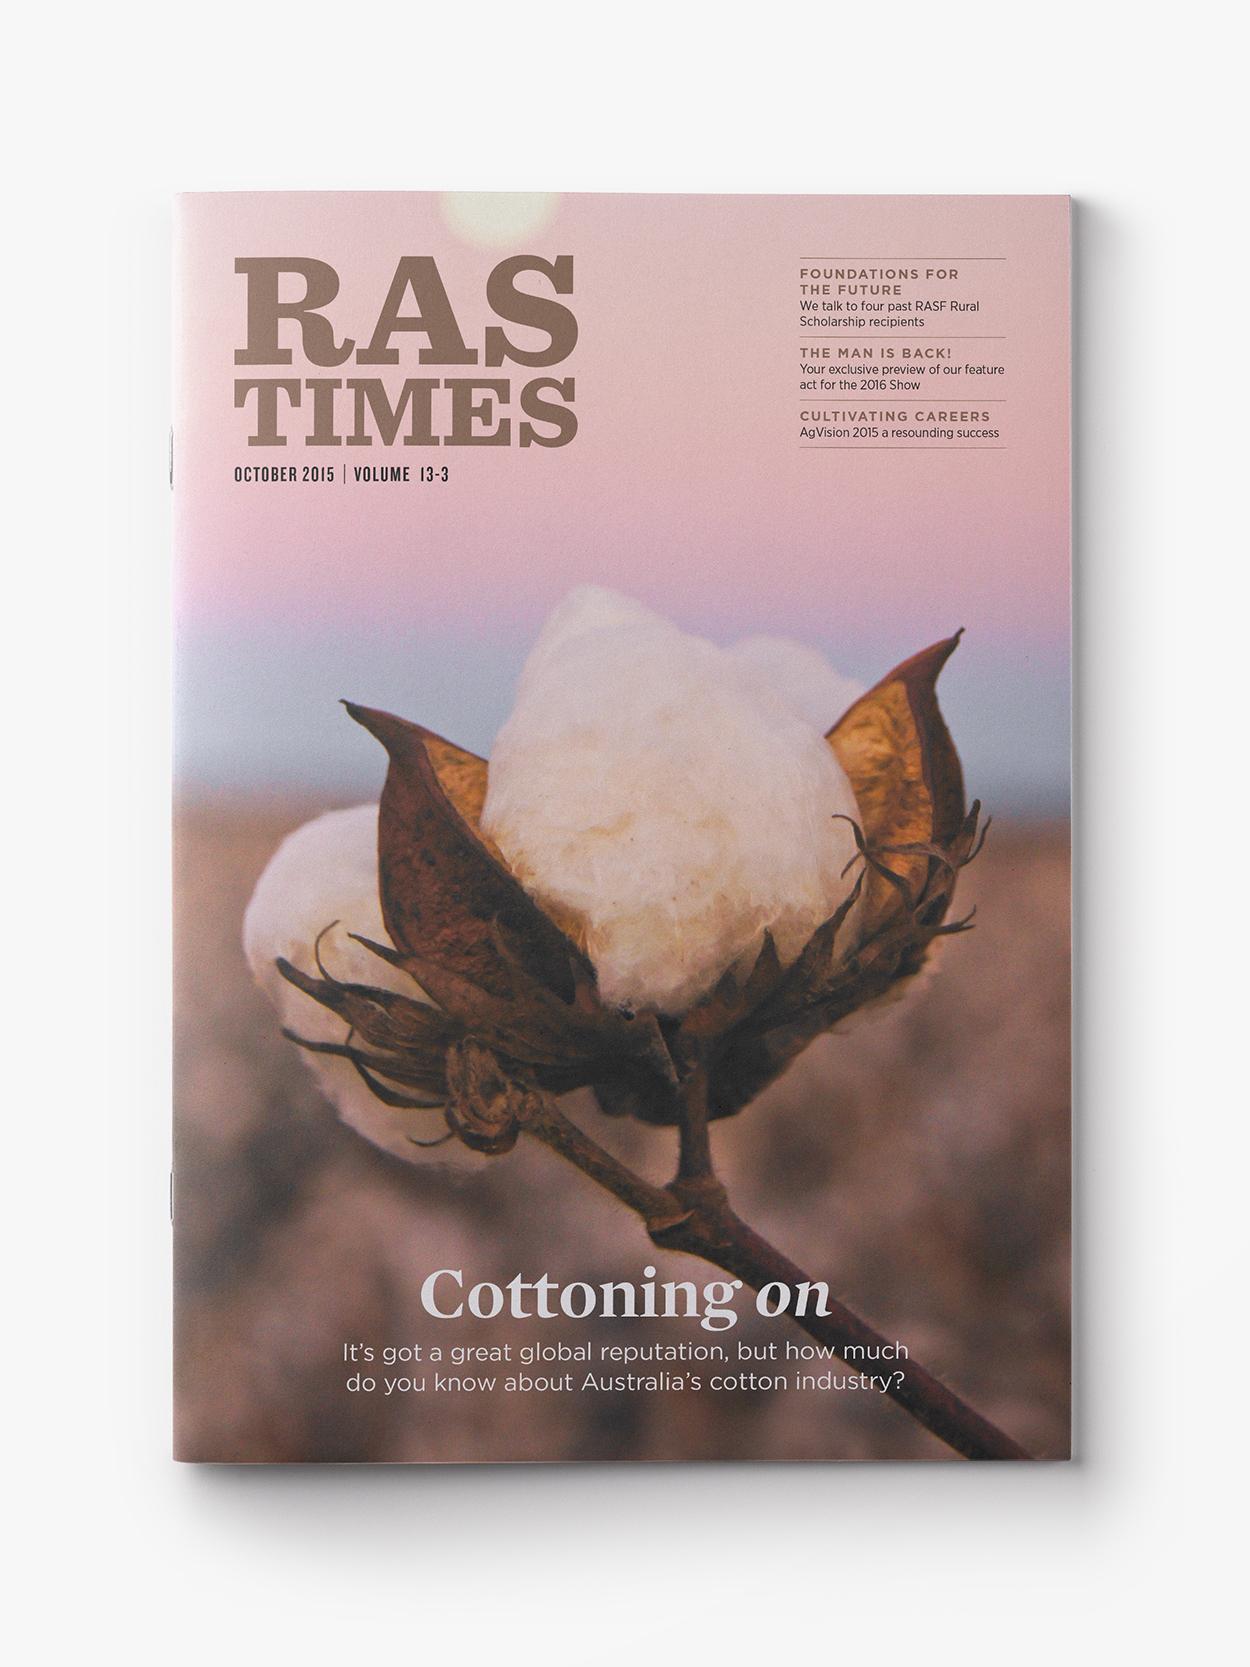 ras times_cover-single-2.jpg